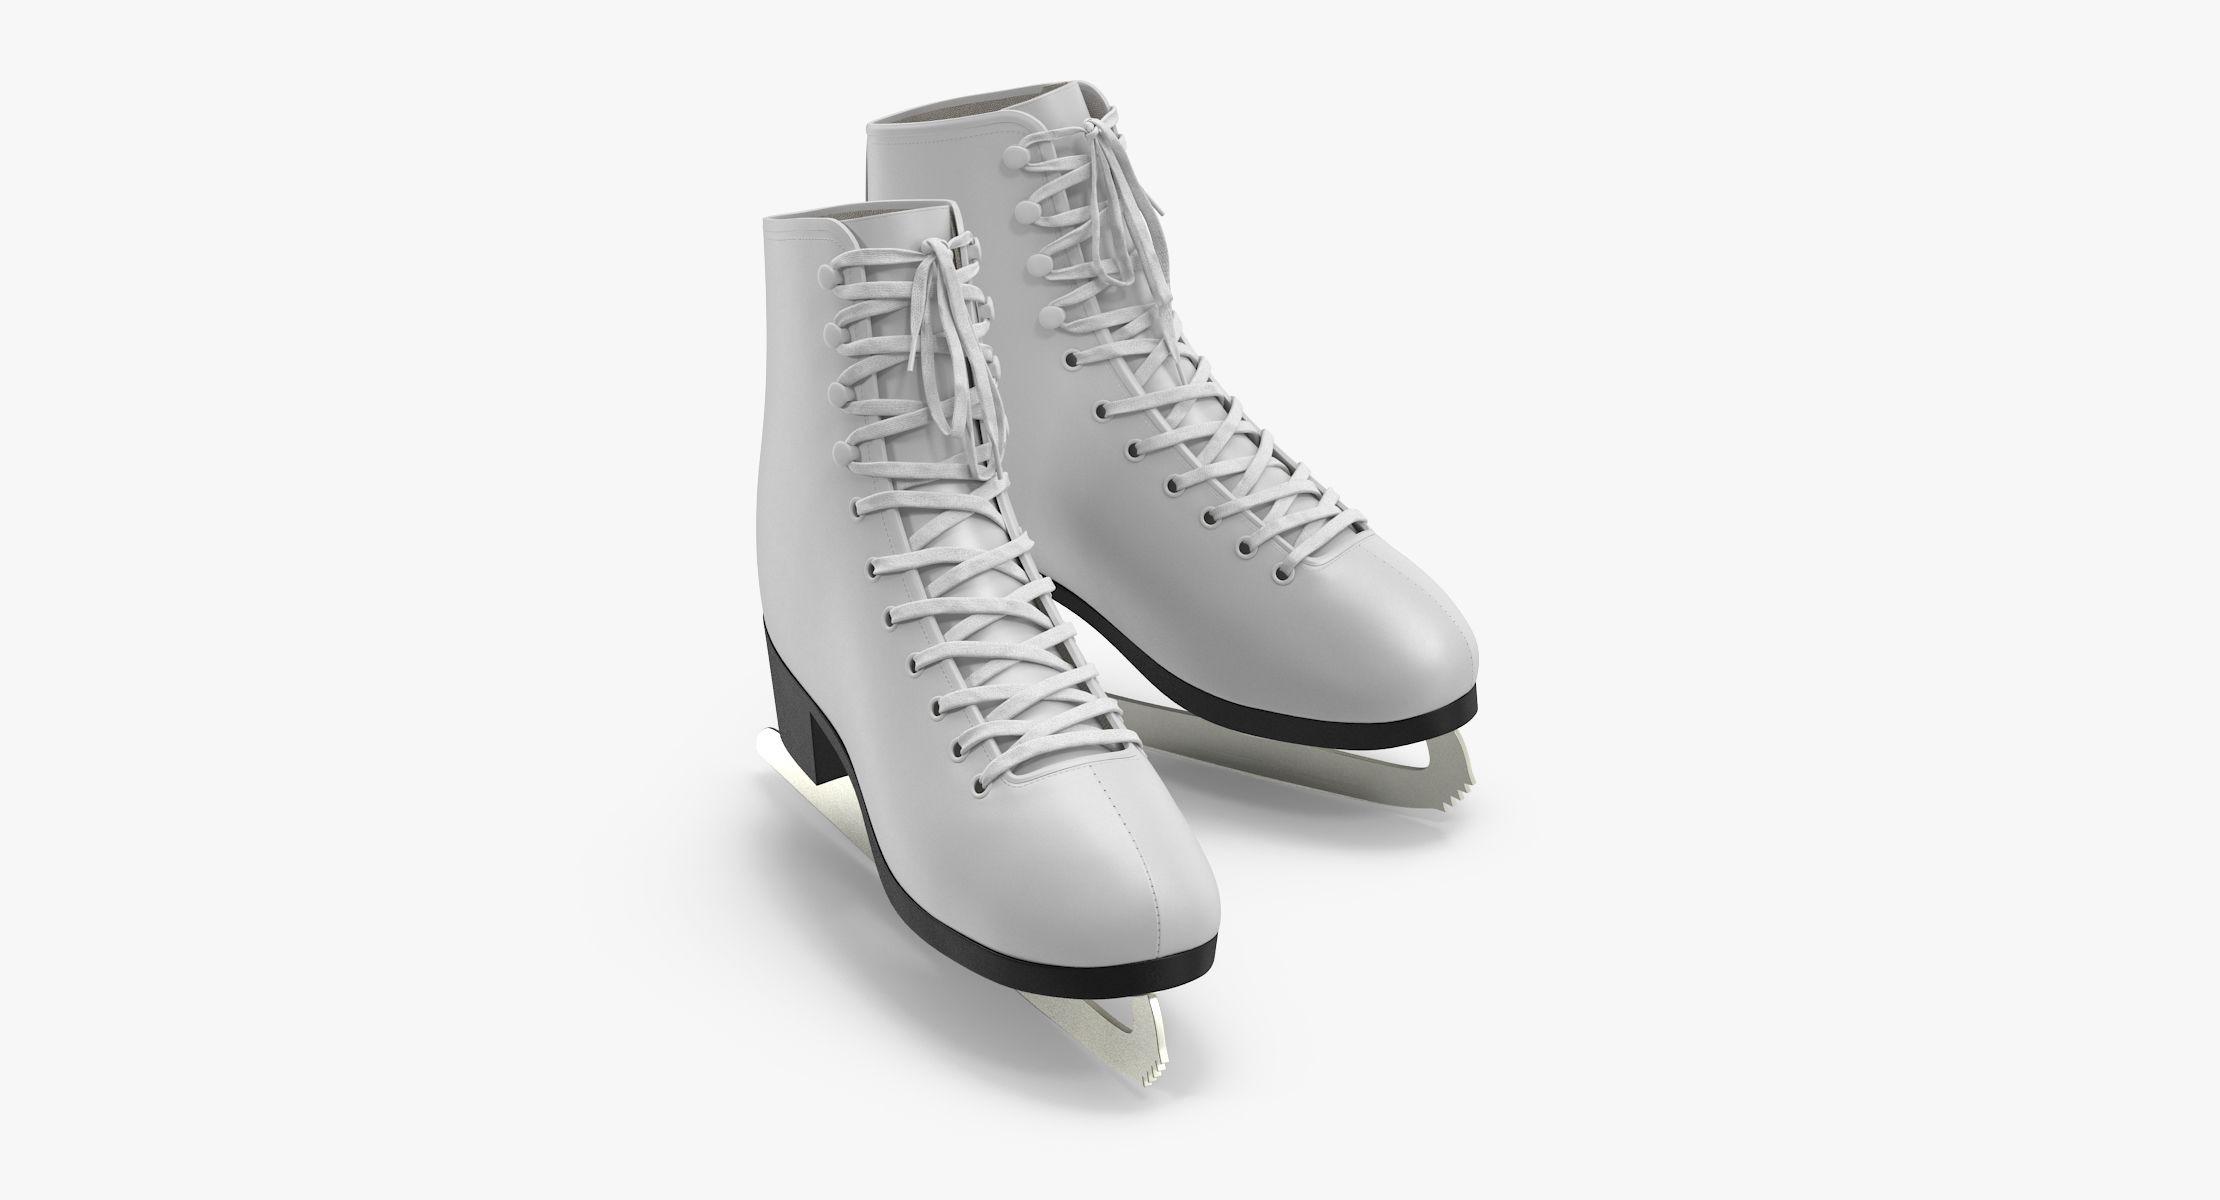 Ice Skates - reel 1